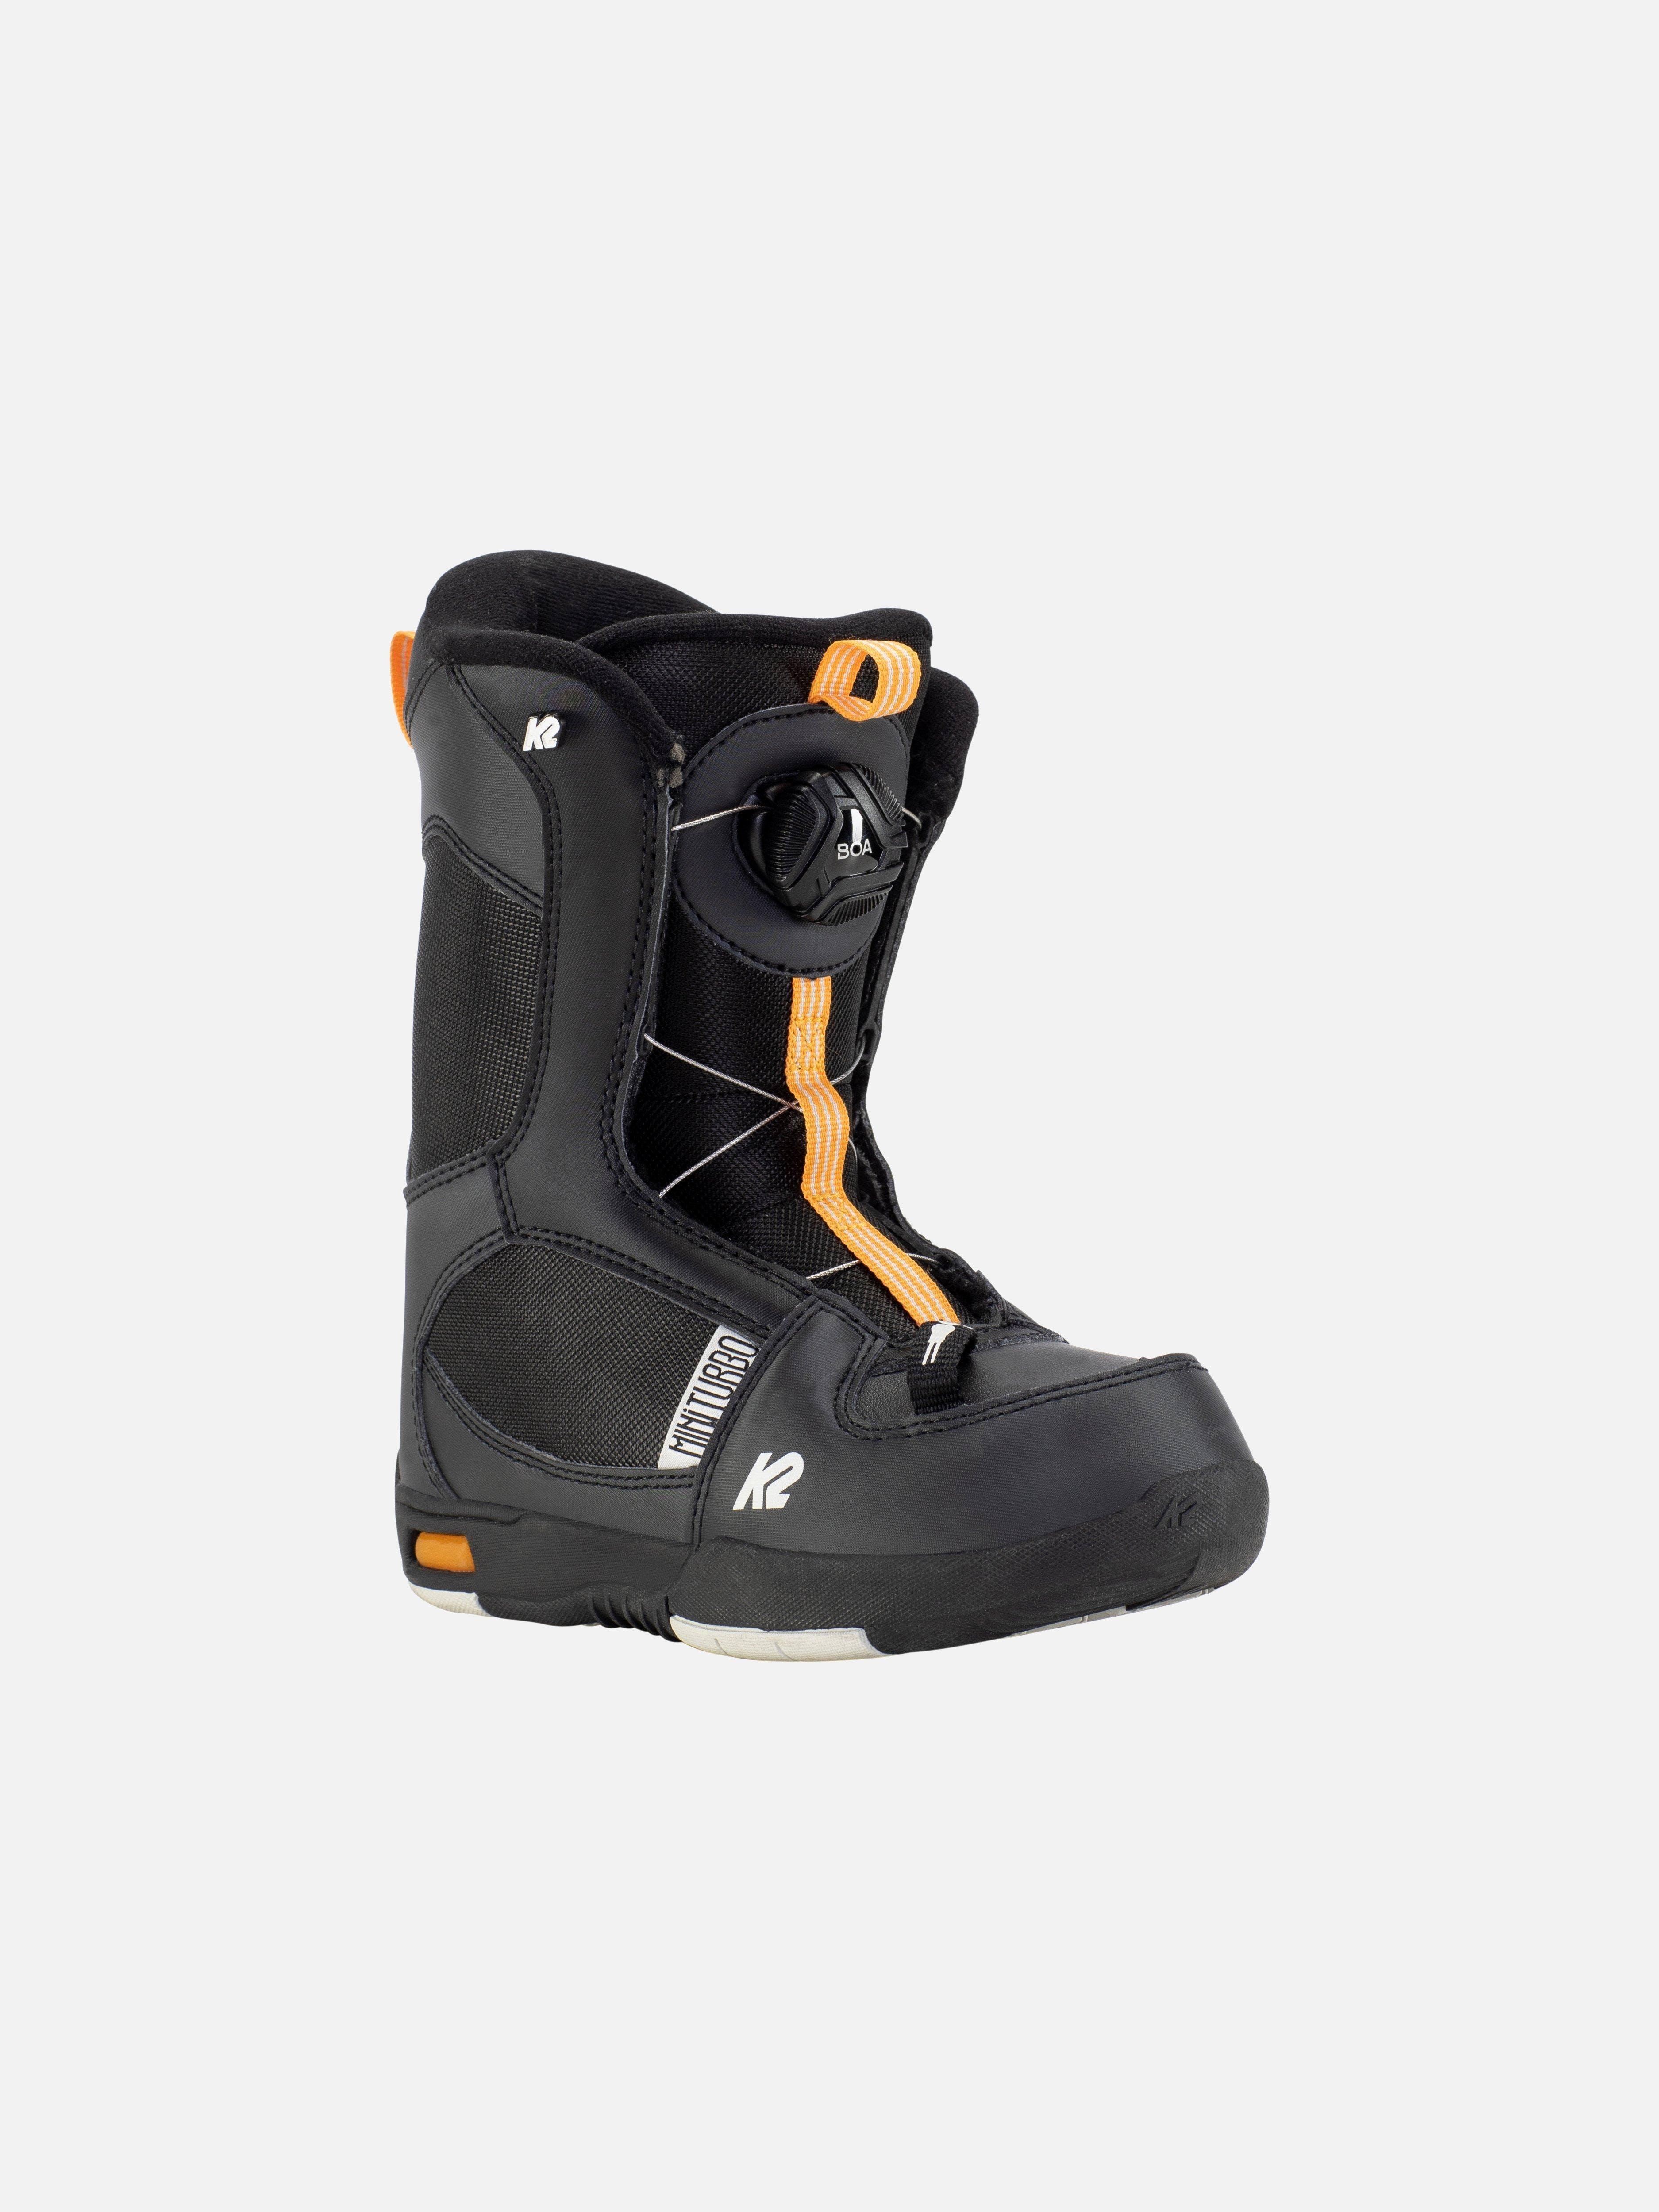 K2 Mini Turbo  Snowboard Boots 11k Snowboard Bindings · 2020